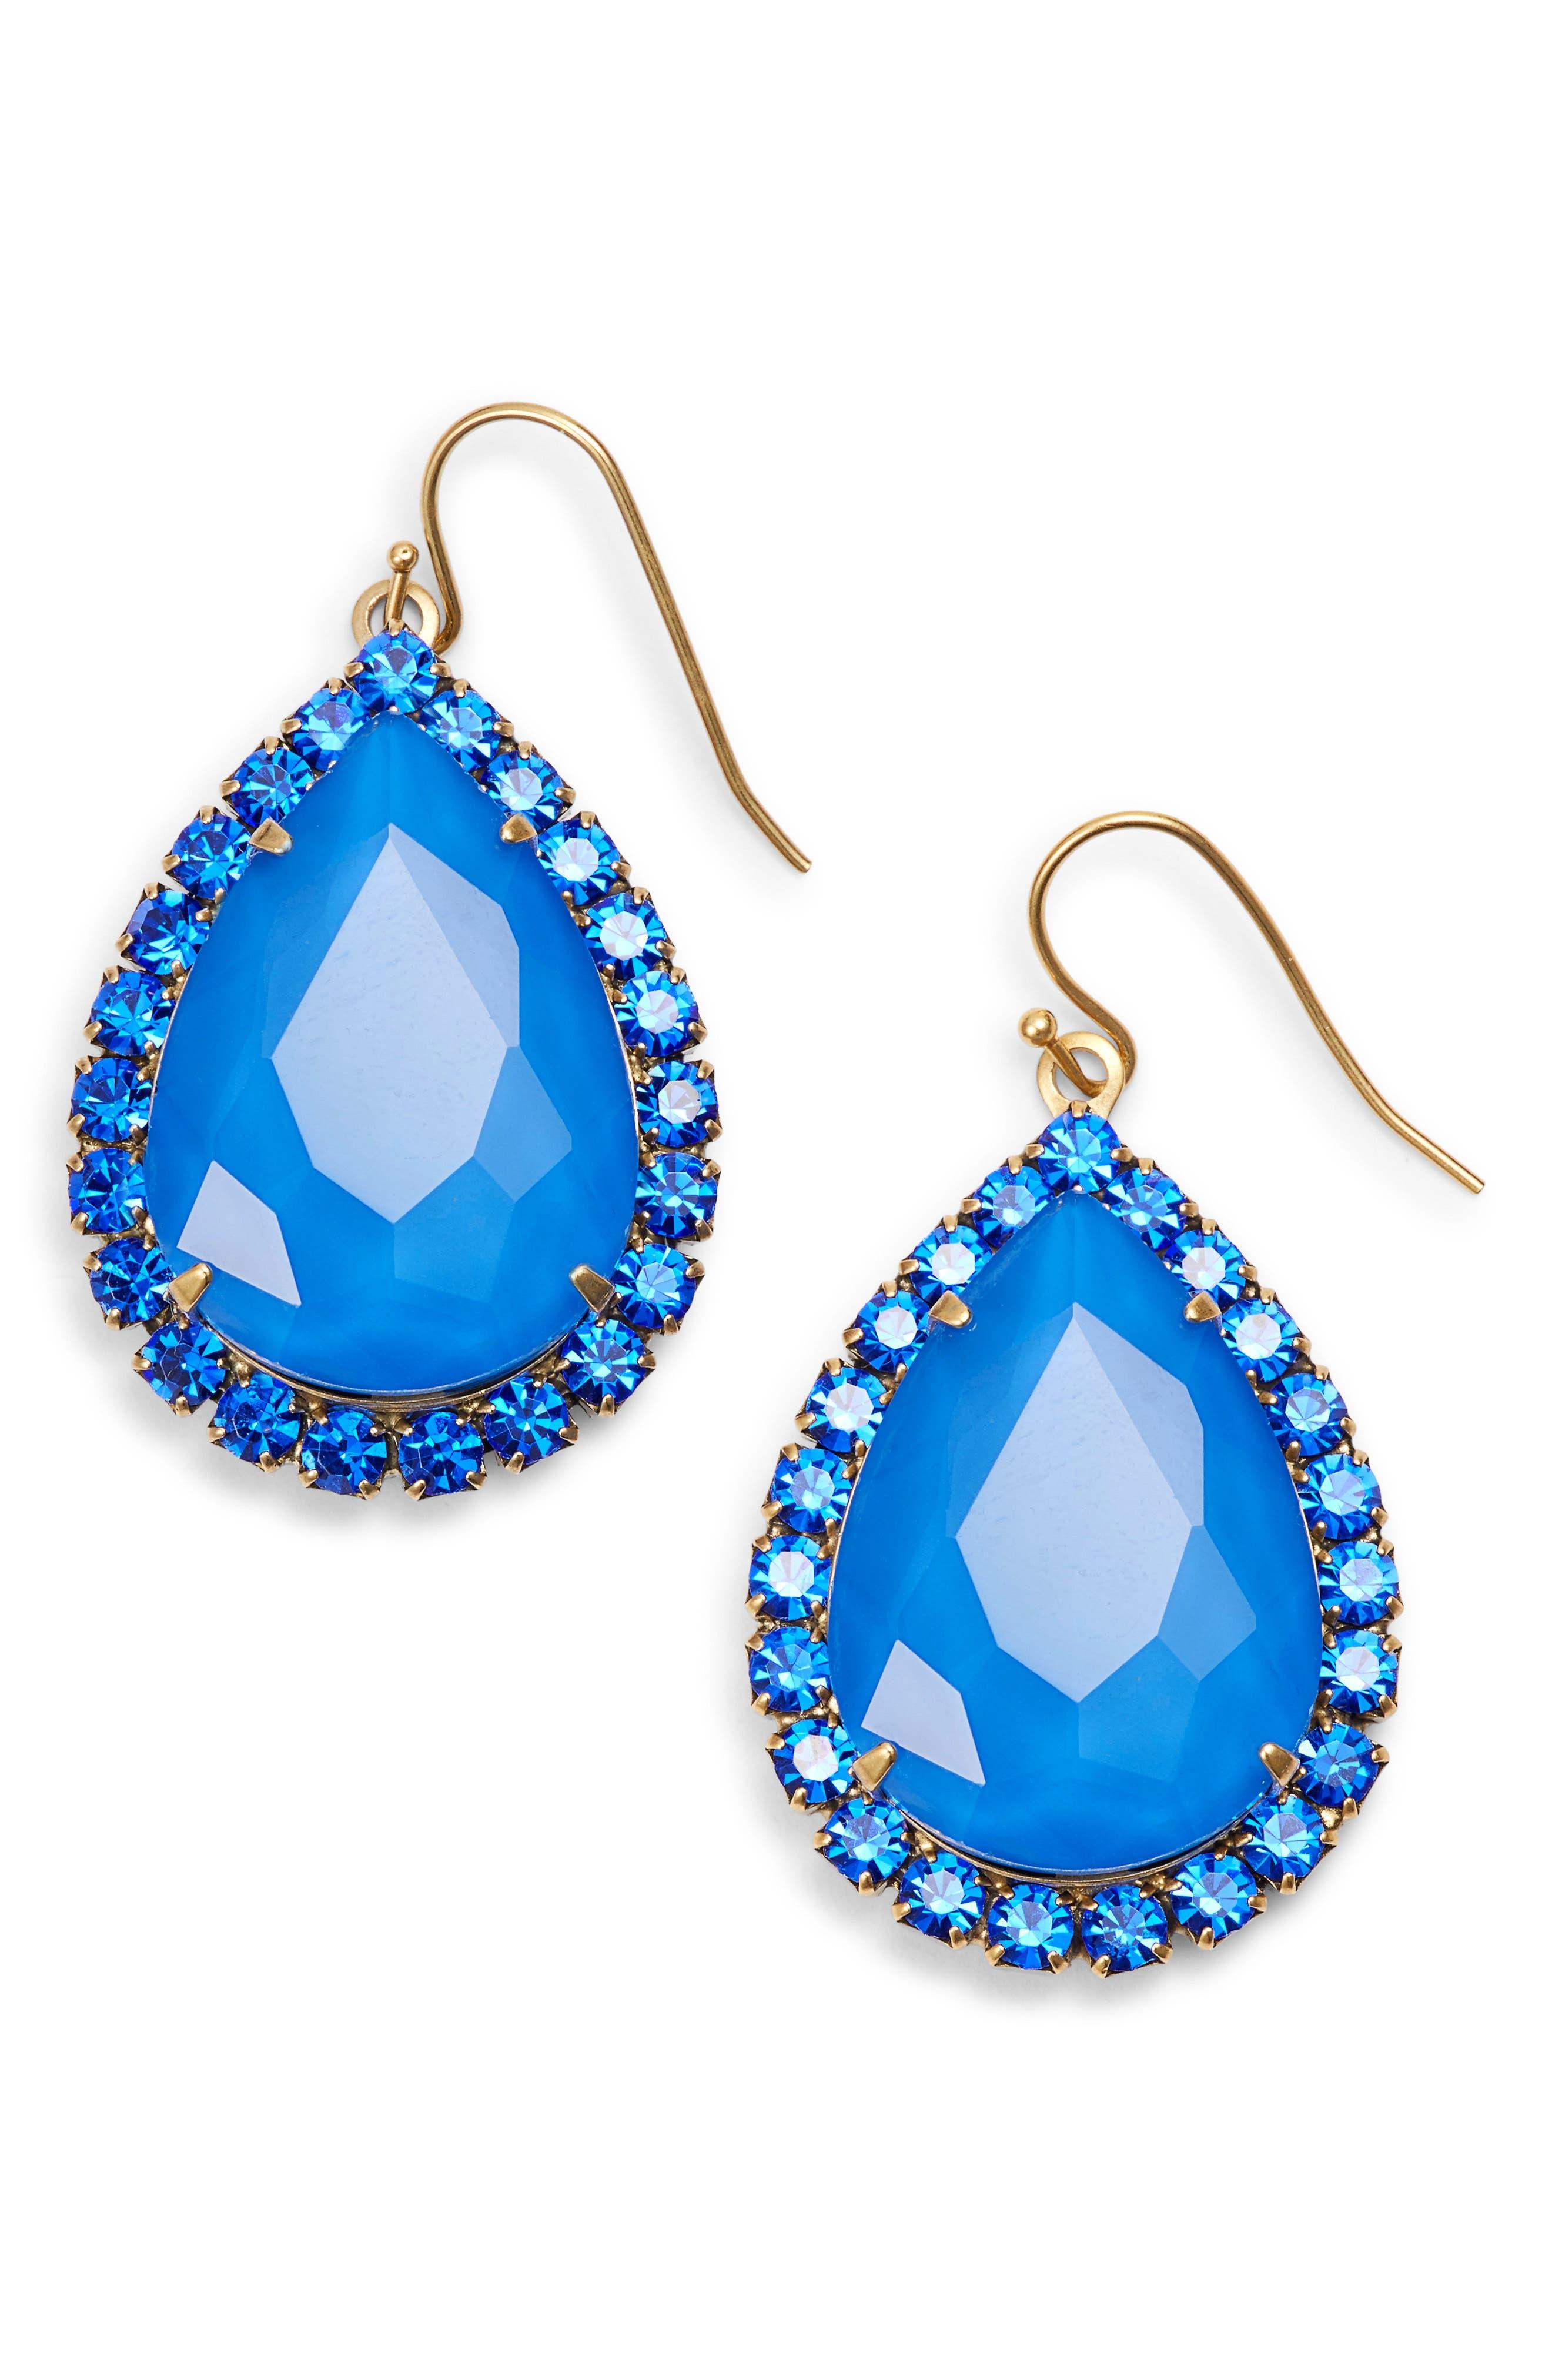 Loren Hope Krista Crystal Drop Earrings